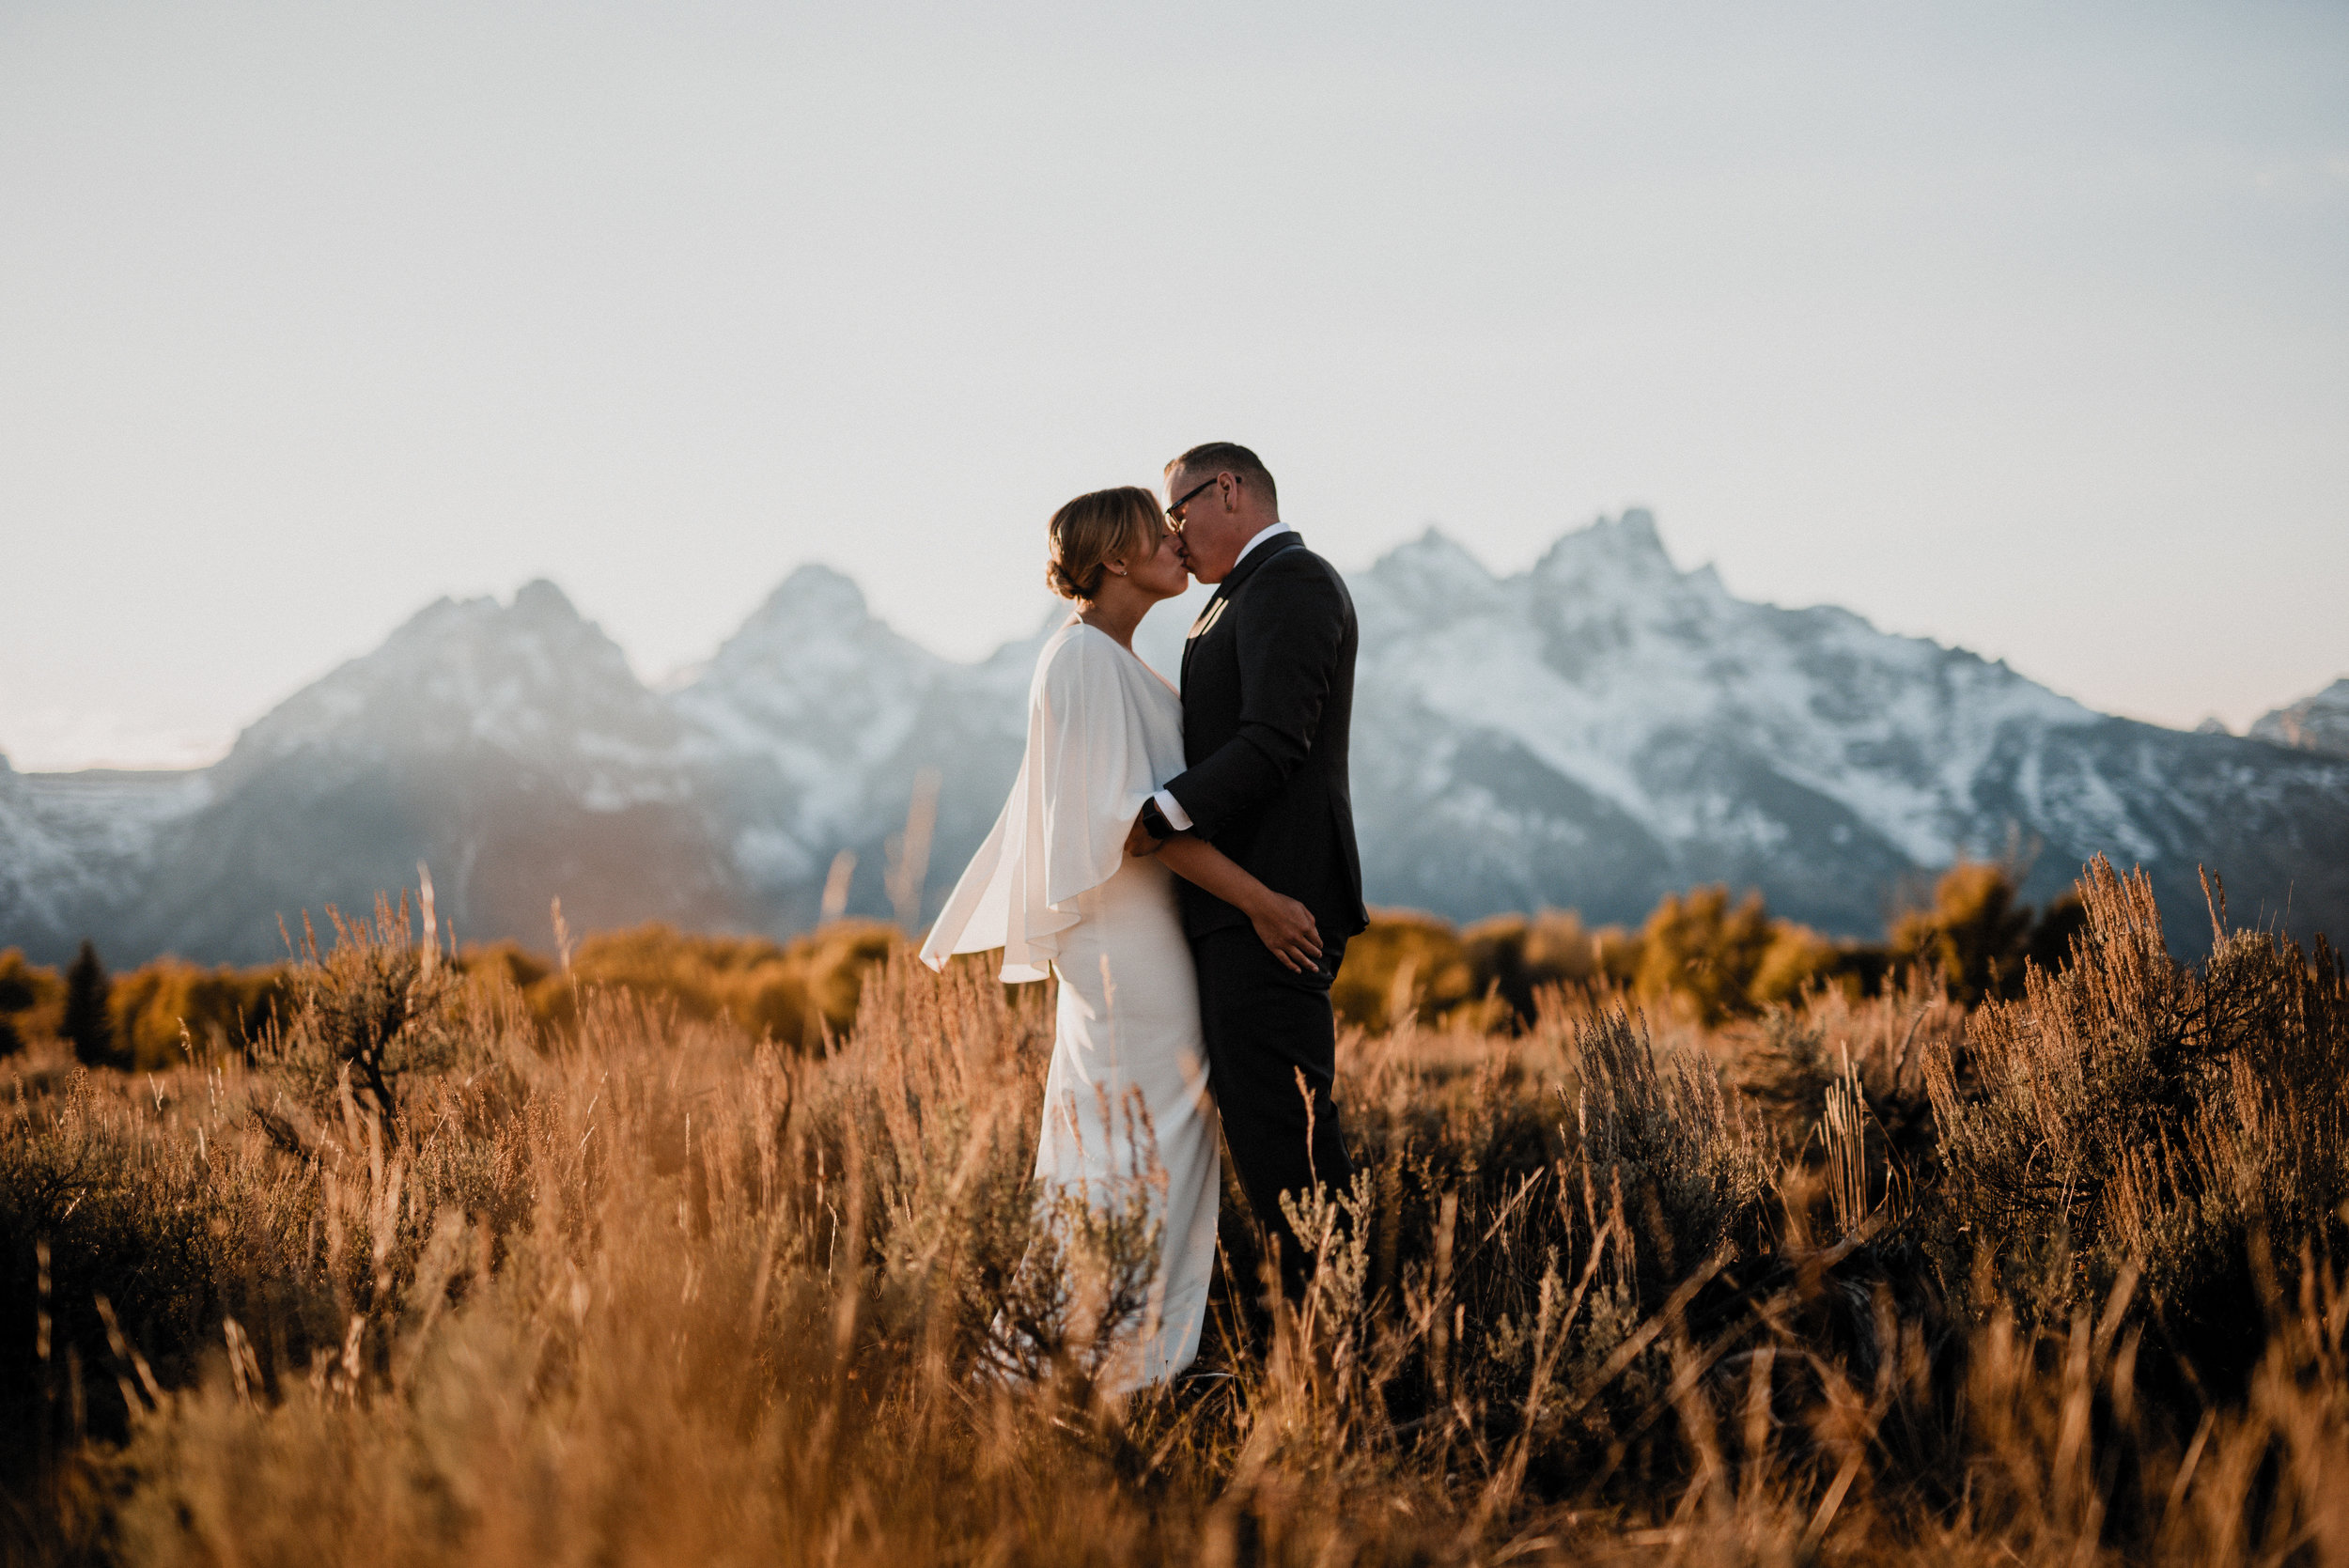 Jackson Hole Wyoming Wedding Photographer, Intimate Lovers underneath Grand Teton National Park